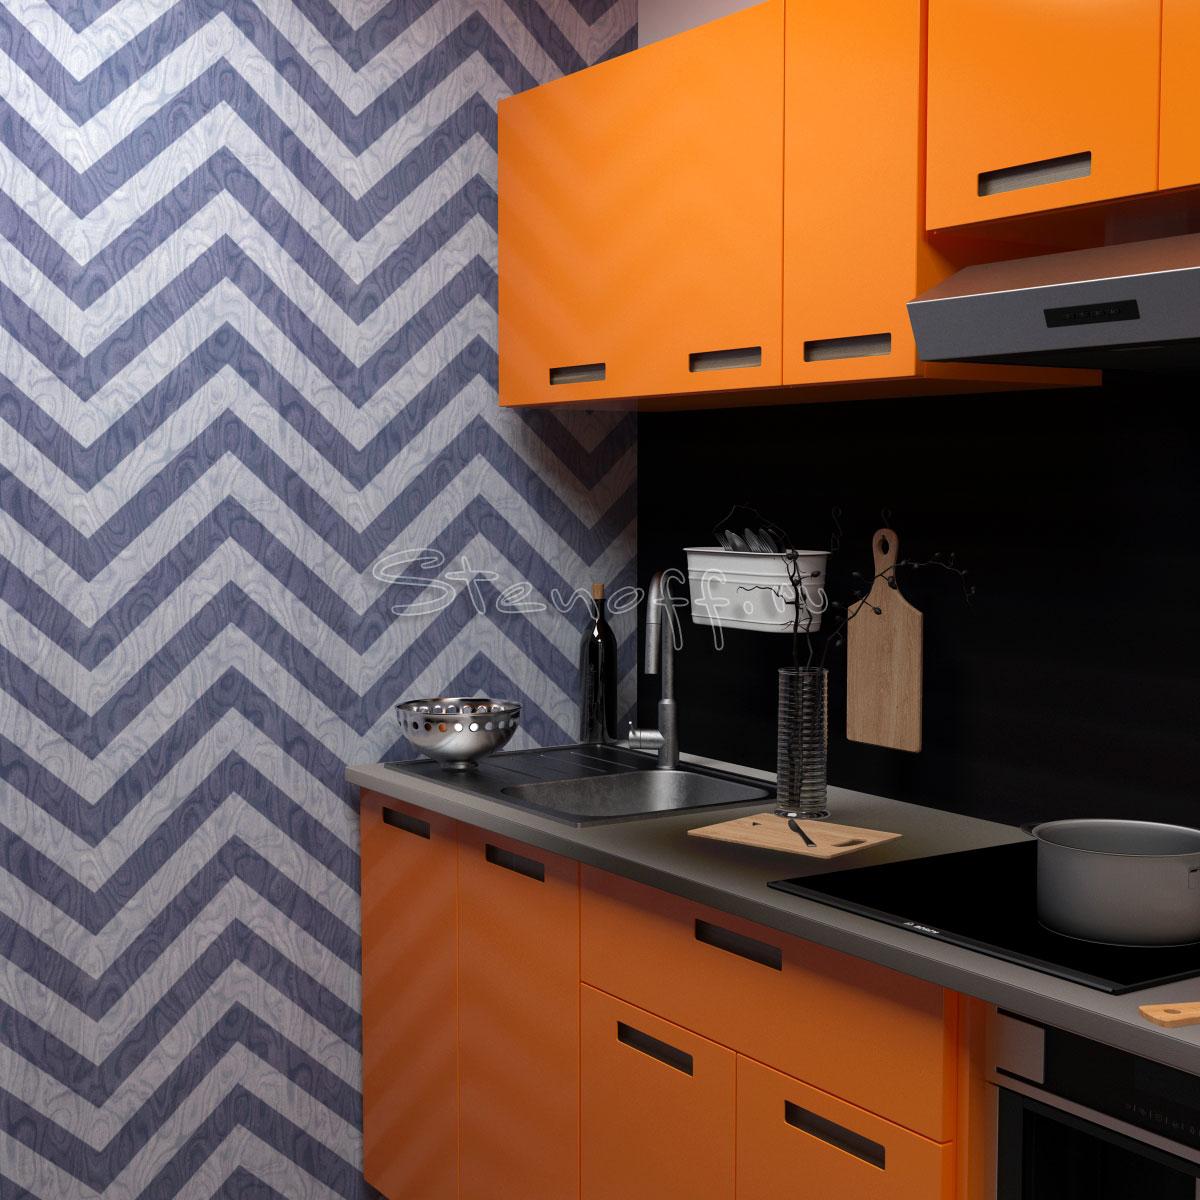 Обои шеврон и оранжевая кухня